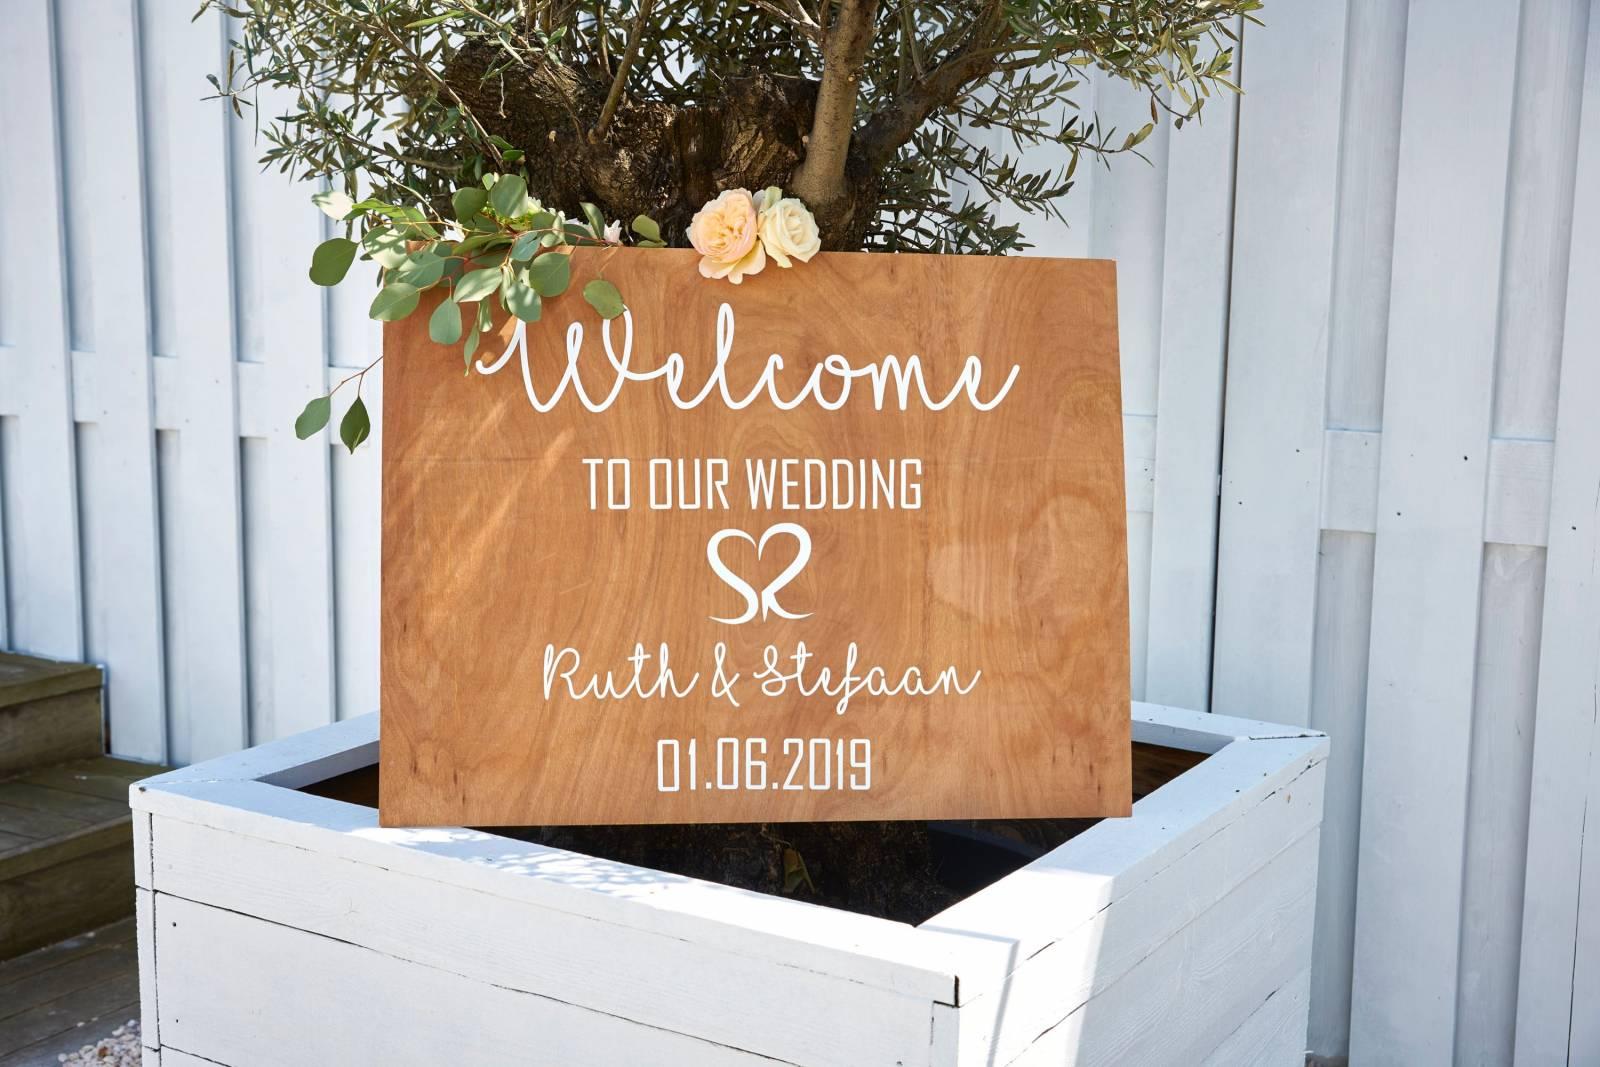 Strantwerpen - Feestzaal - Trouwzaal - Trouwen op het Strand - House of Weddings - 13